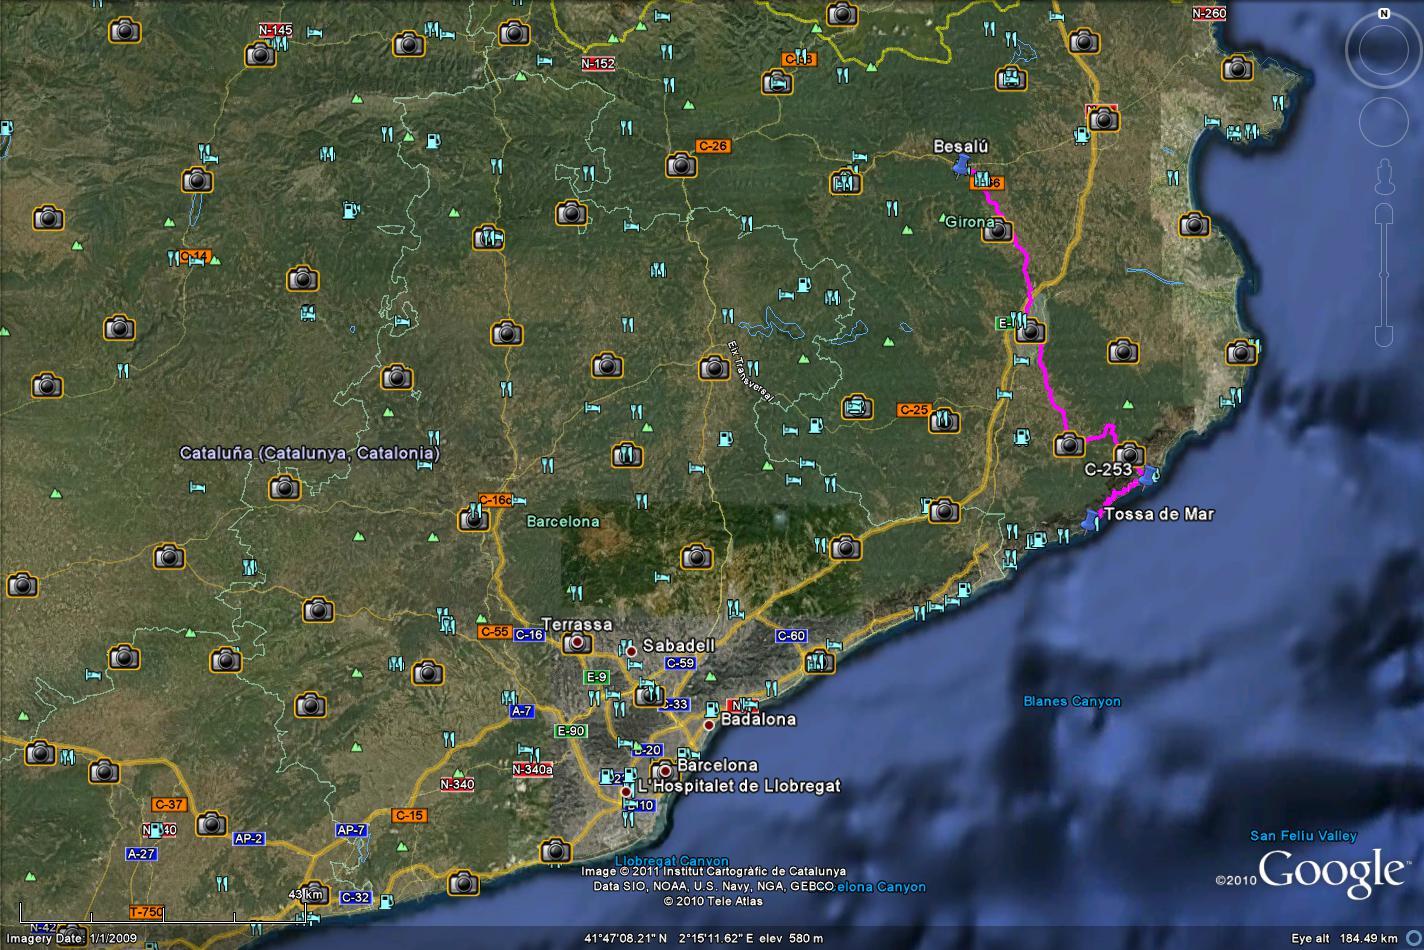 Tossa to Besalu GE map